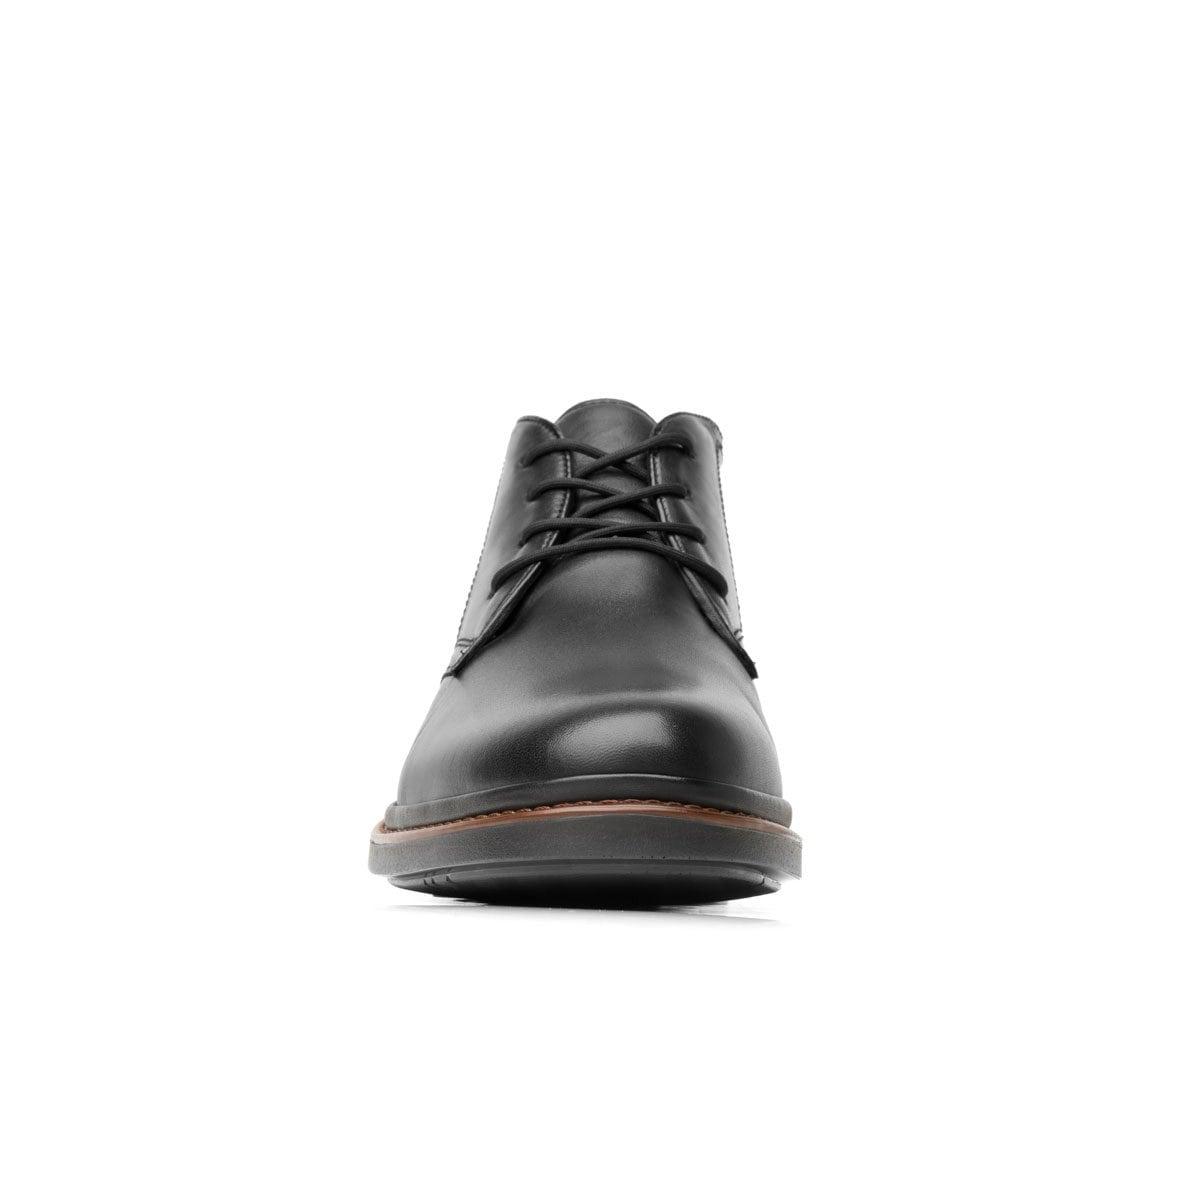 89e5939c37aa4 Bota negra quirelli